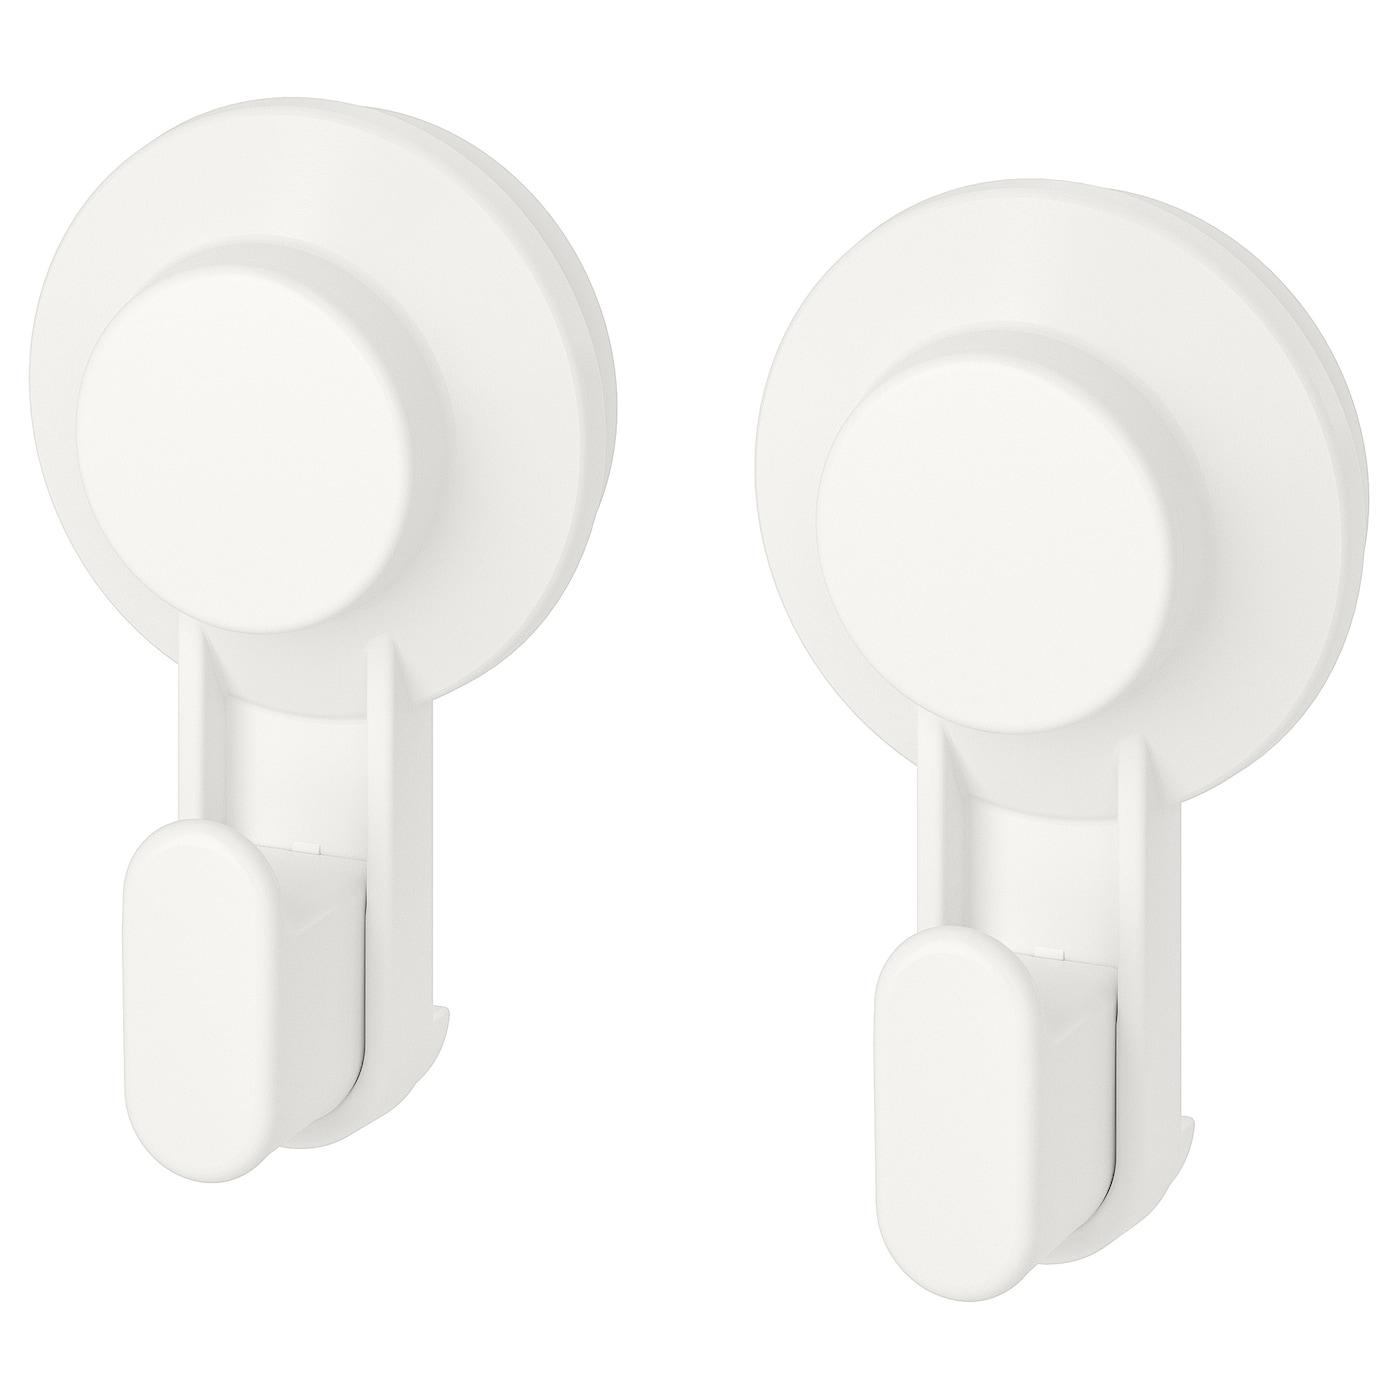 Accessori Bagno A Ventosa Ikea.Tisken Gancio Con Ventosa Bianco Ikea It